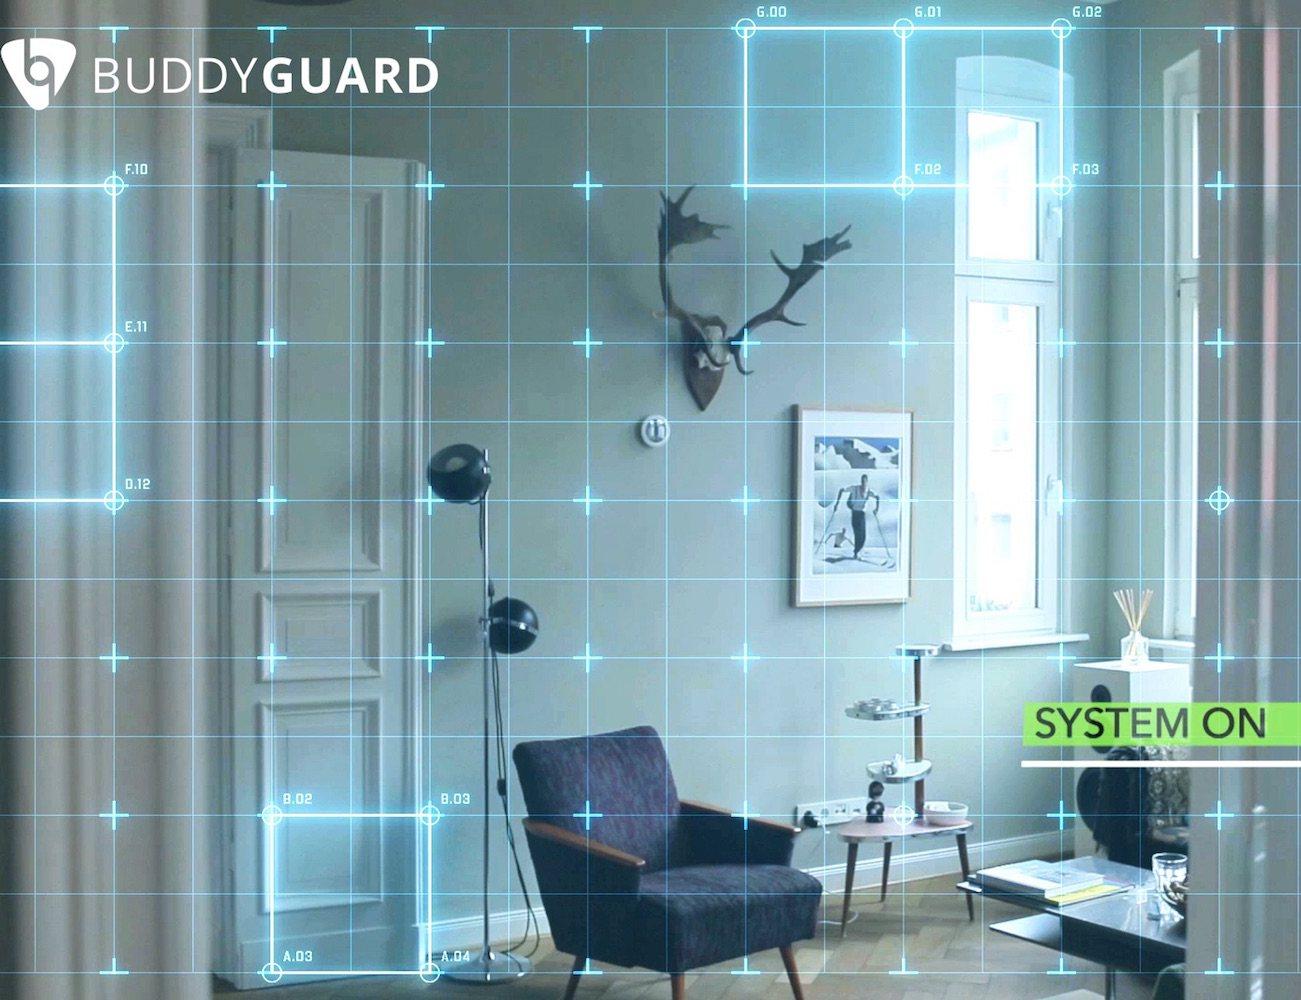 buddyguard flare  home security  u00bb review